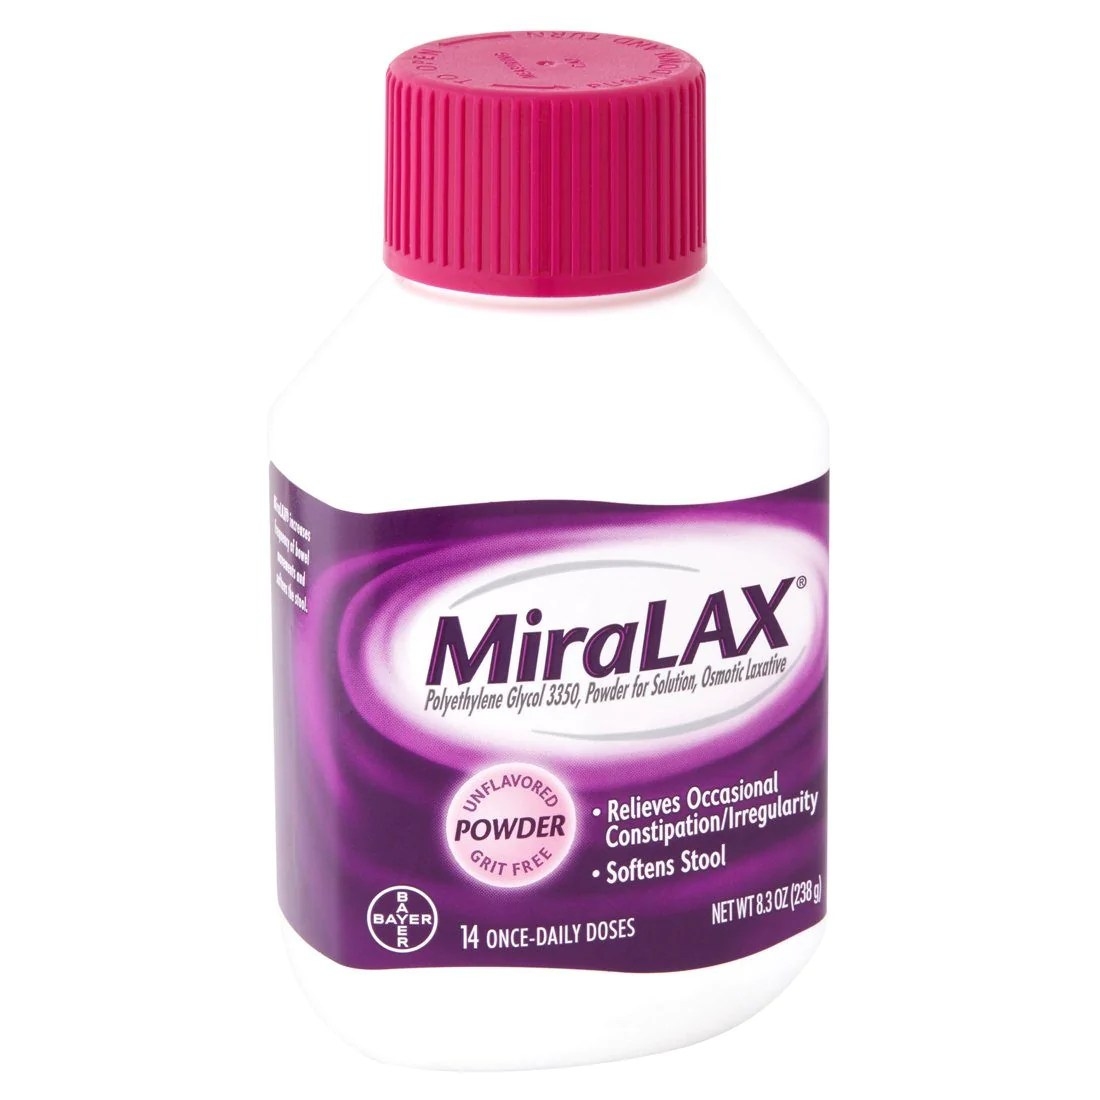 MiraLAX Powder Laxative Constipation Drink 8.3 oz